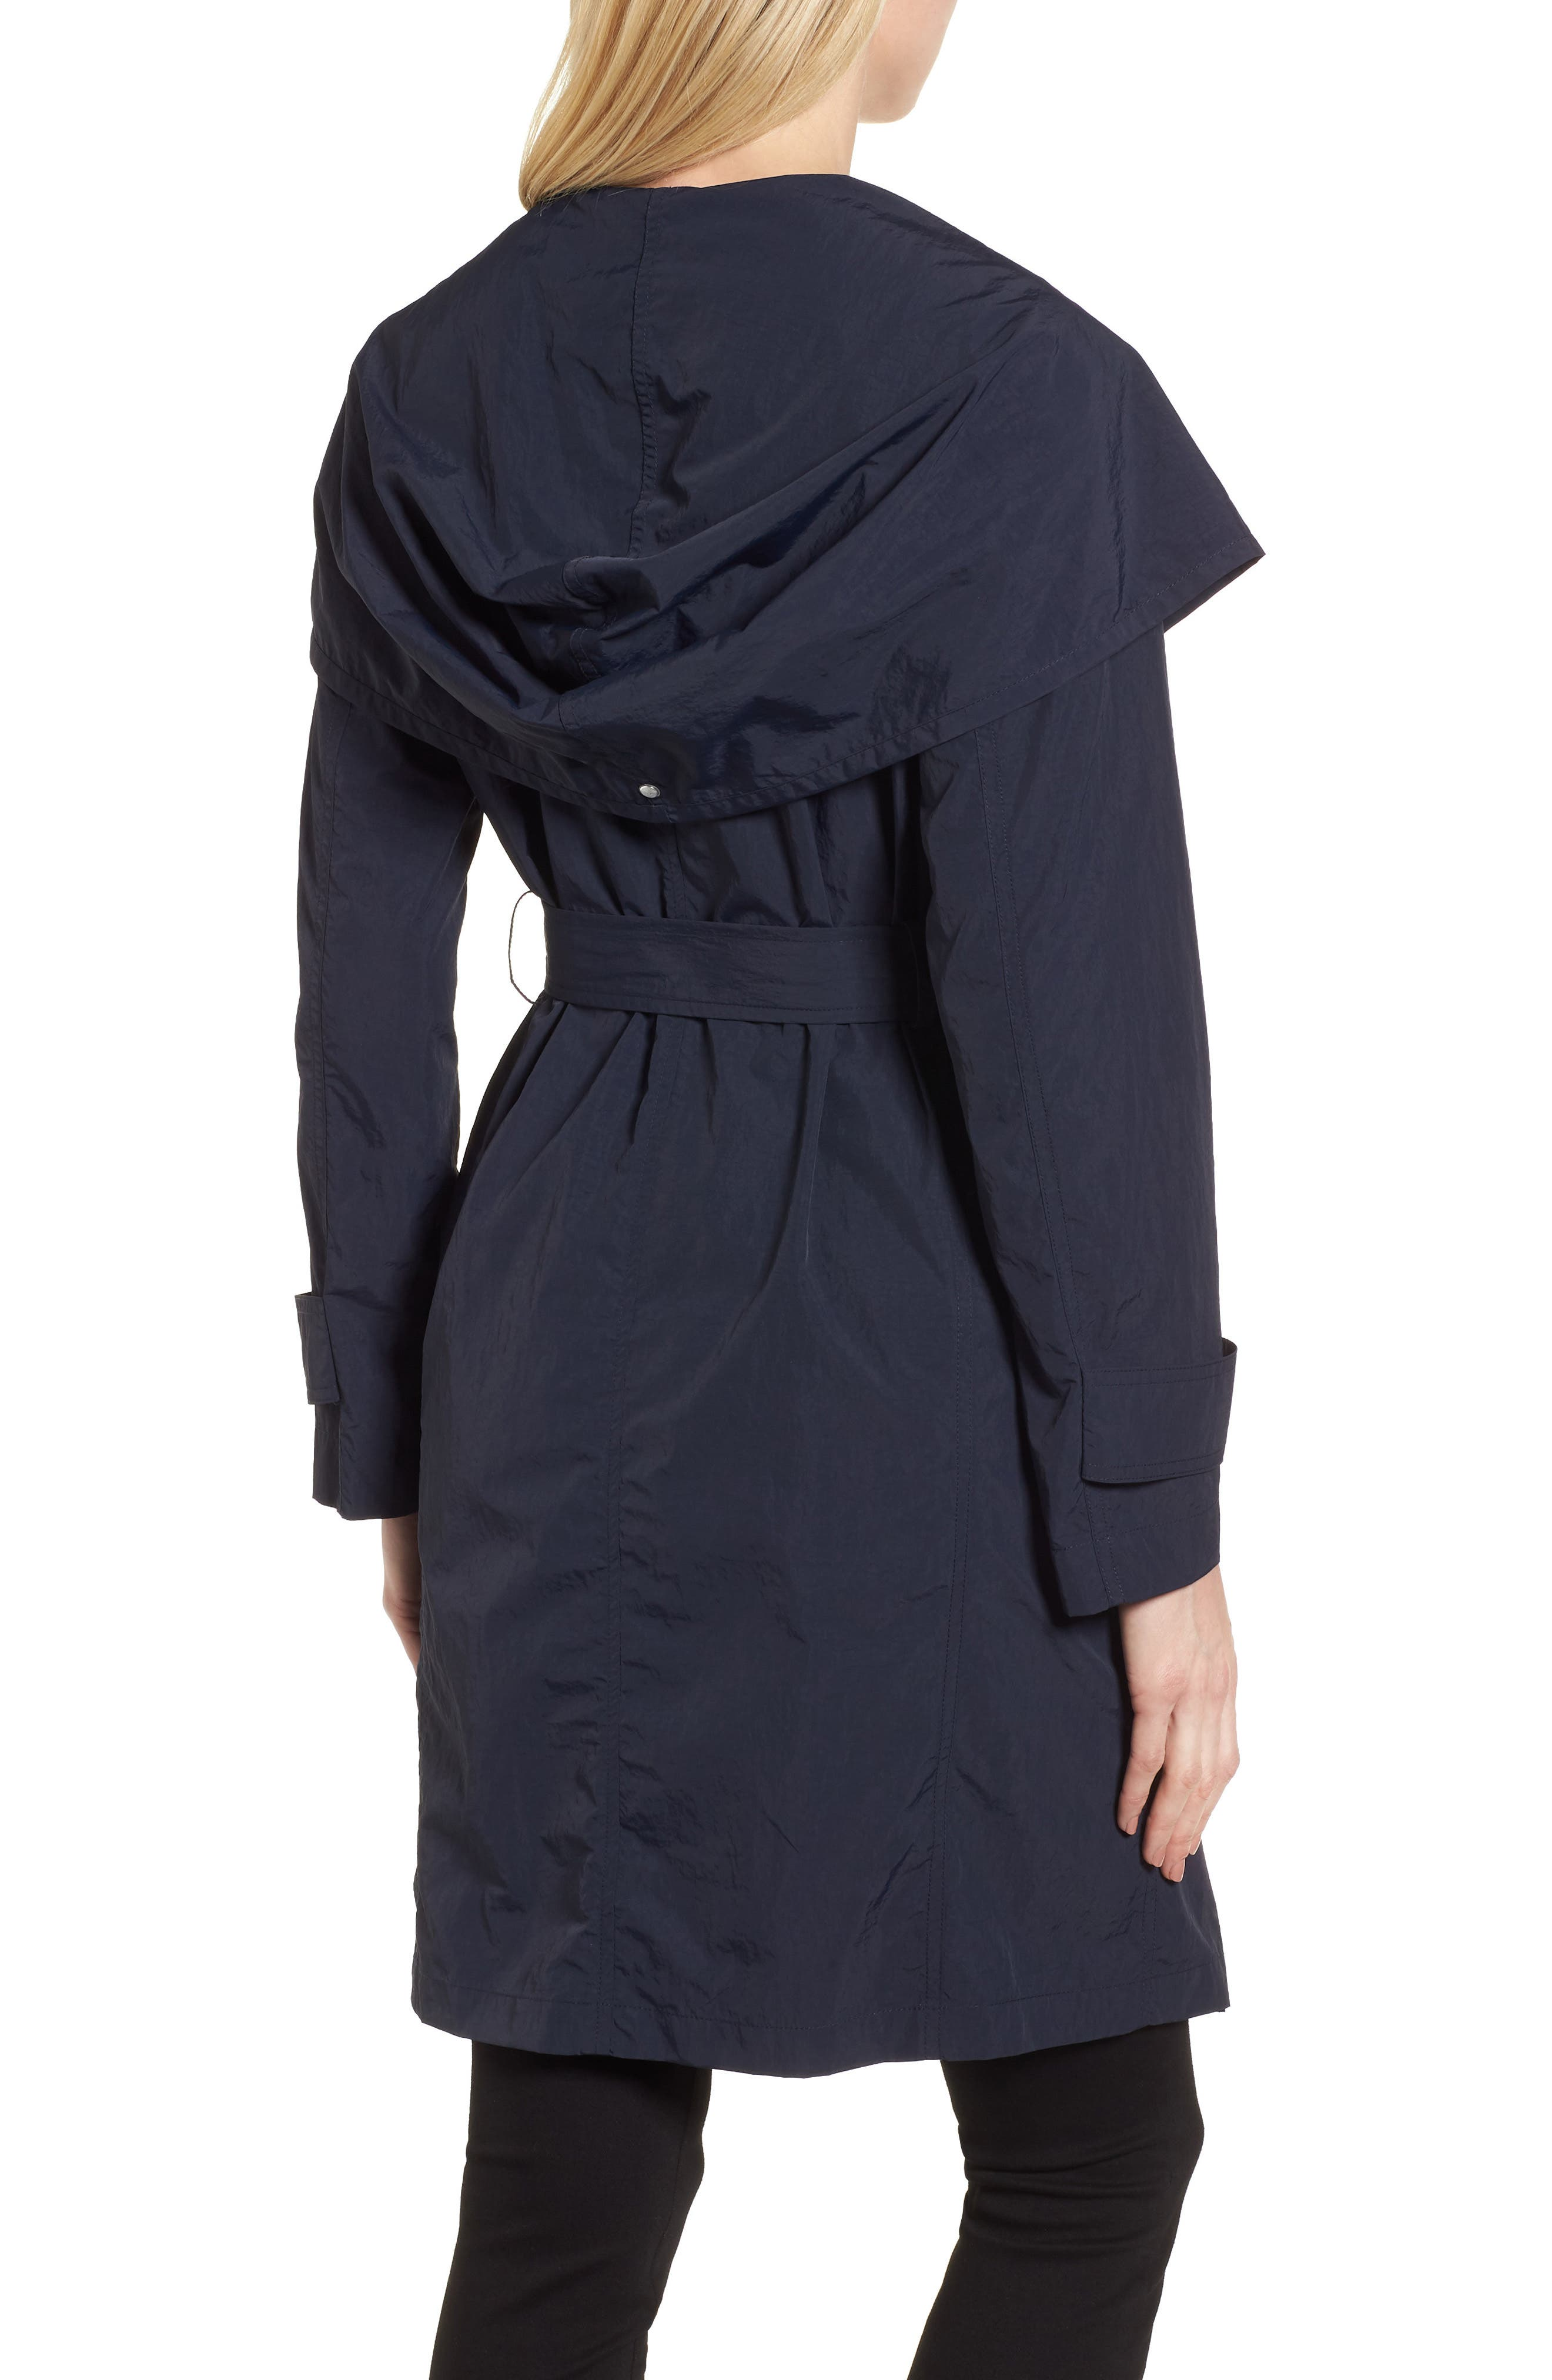 Flo Packable Hooded Raincoat,                             Alternate thumbnail 2, color,                             250